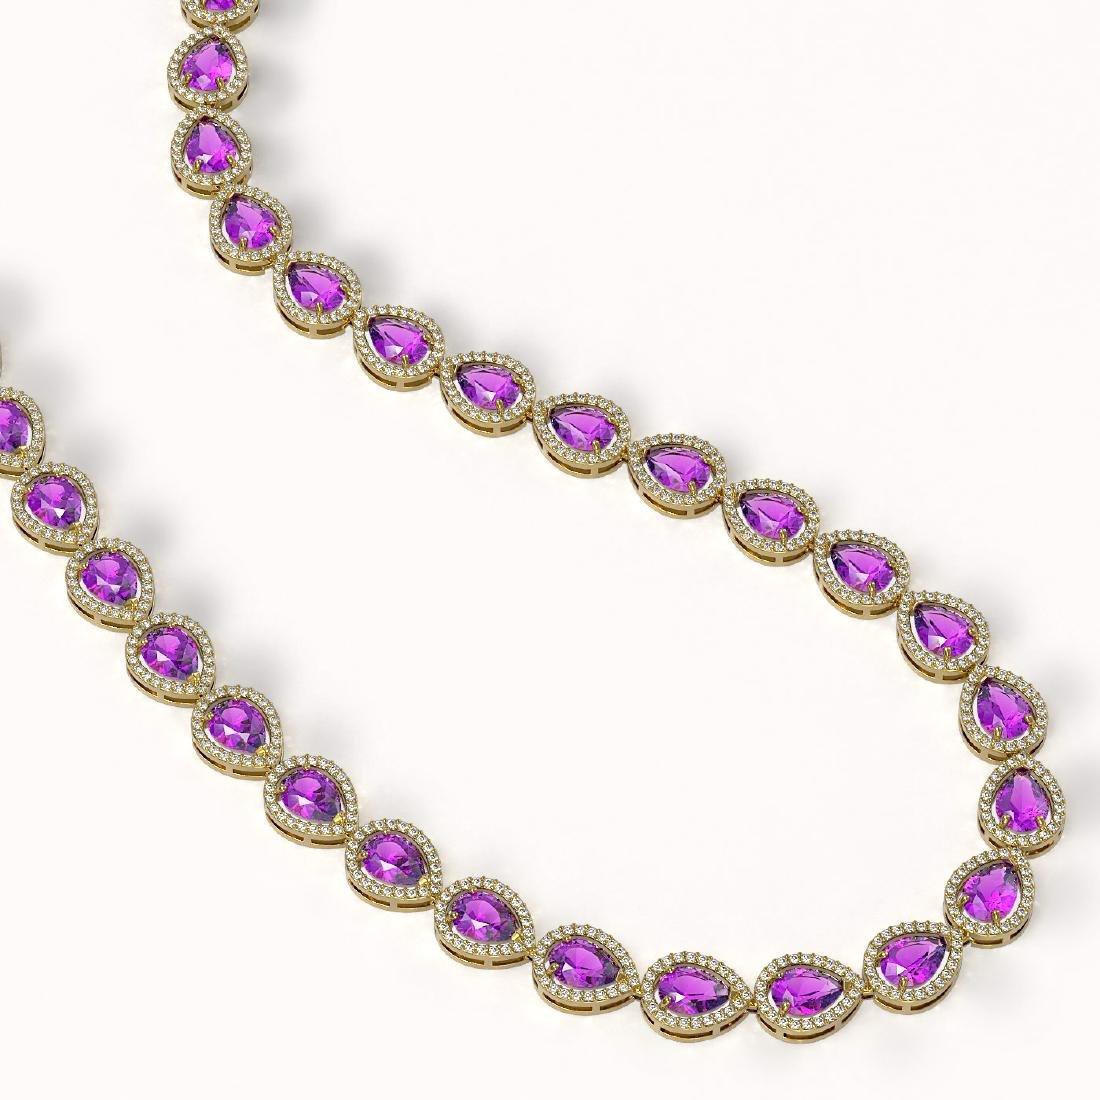 35.13 CTW Amethyst & Diamond Halo Necklace 10K Yellow - 2